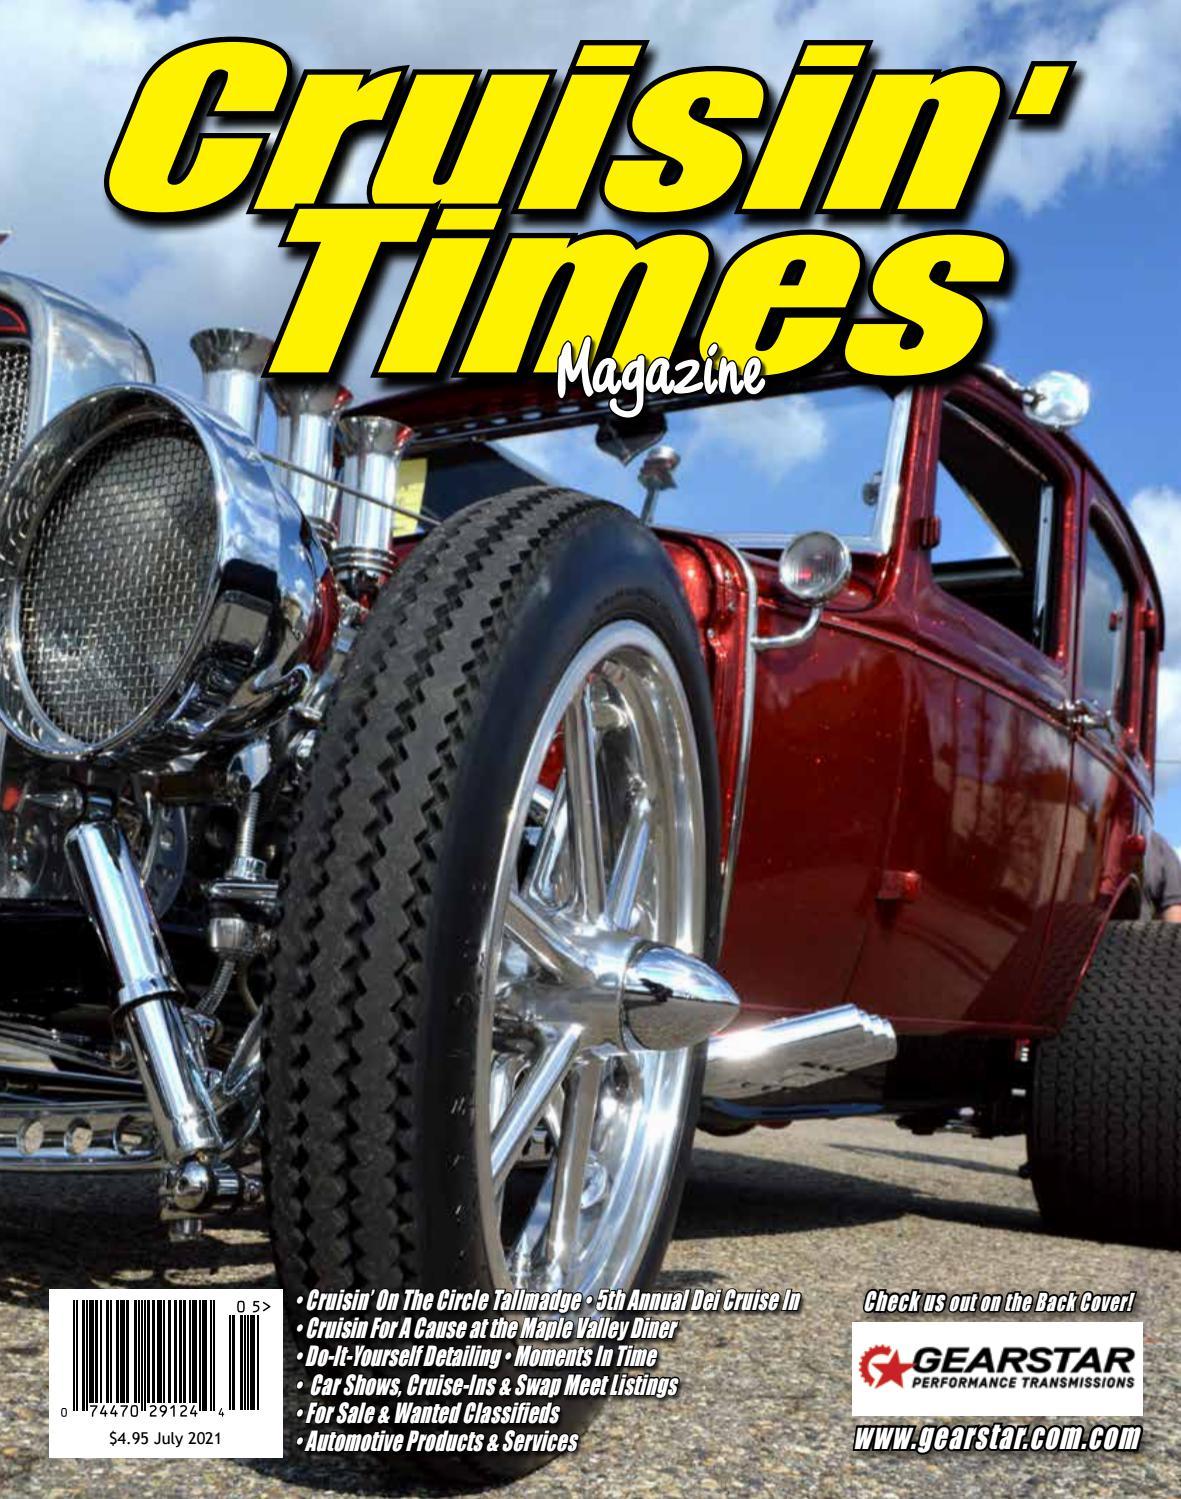 Cruisin Times Magazine - July 2021 Issue by Cruisin' Times Magazine - issuu